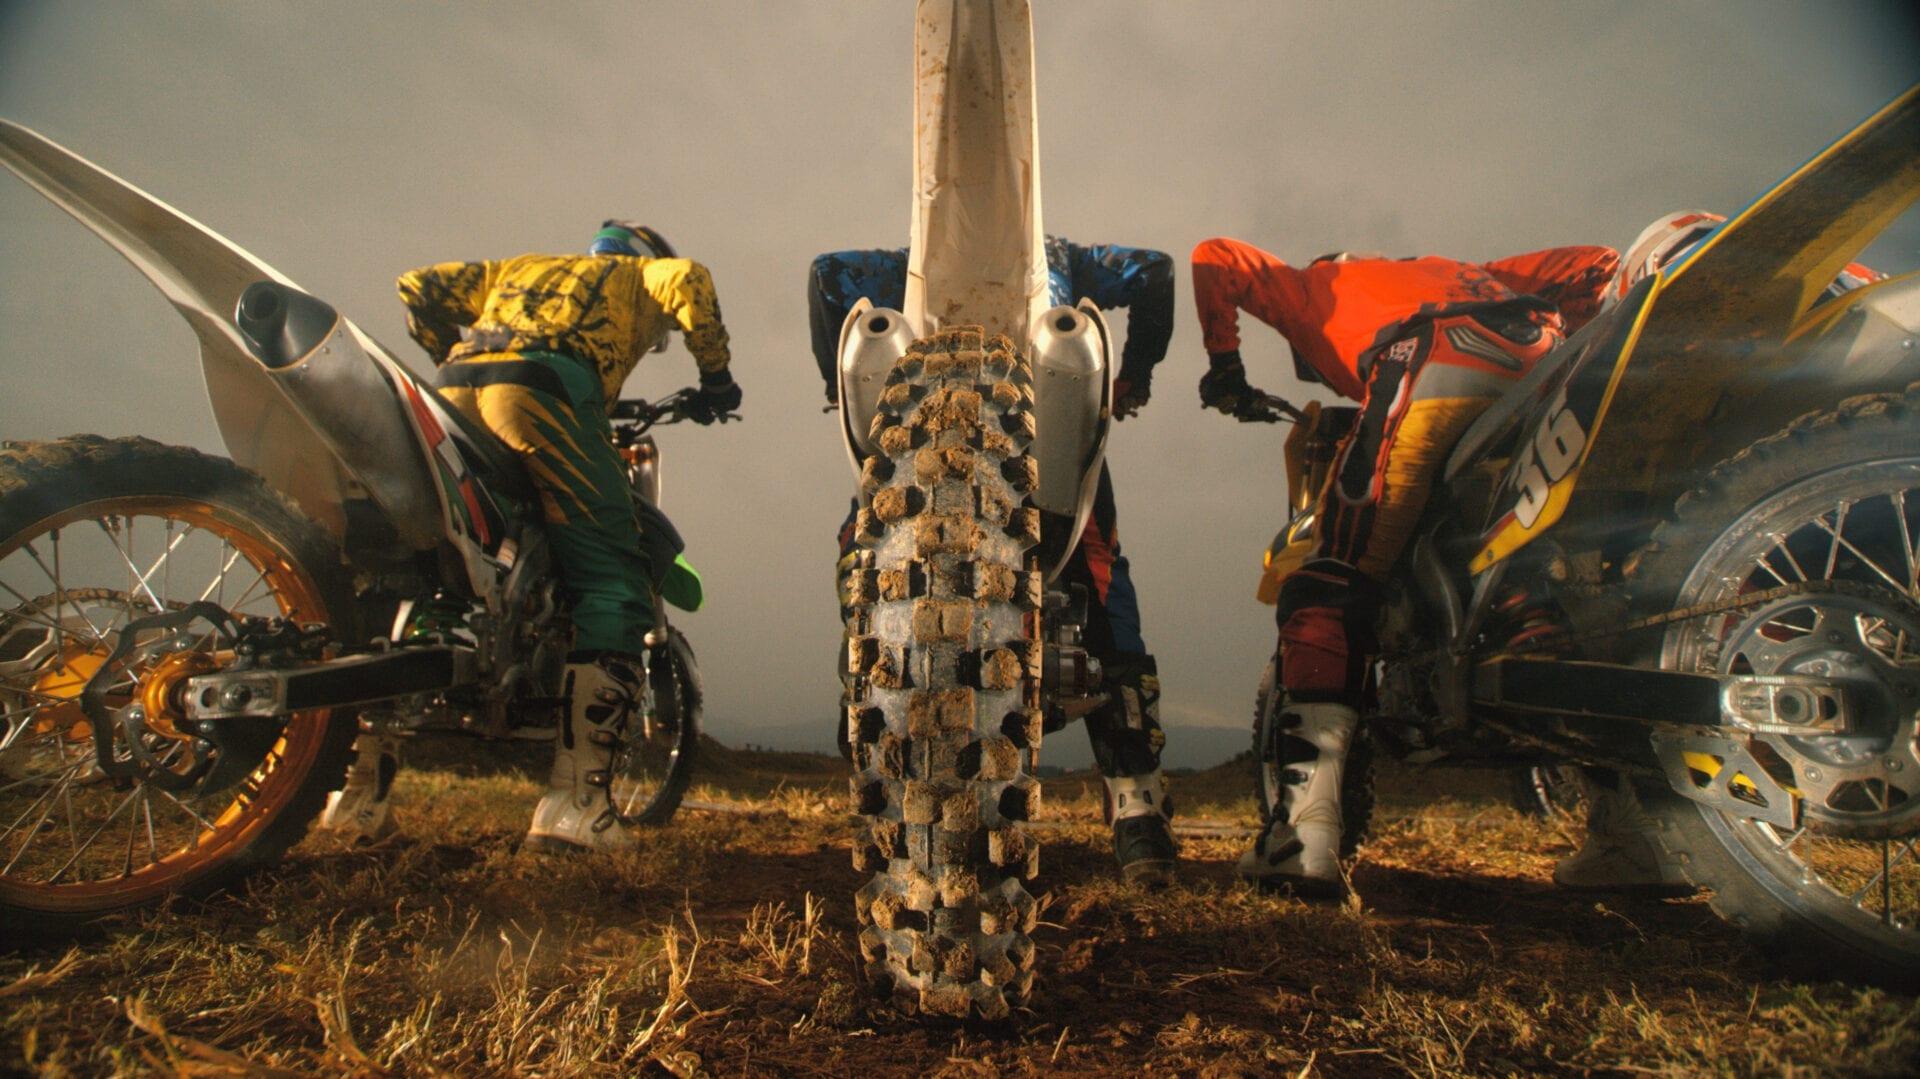 Motocross riders at start of race